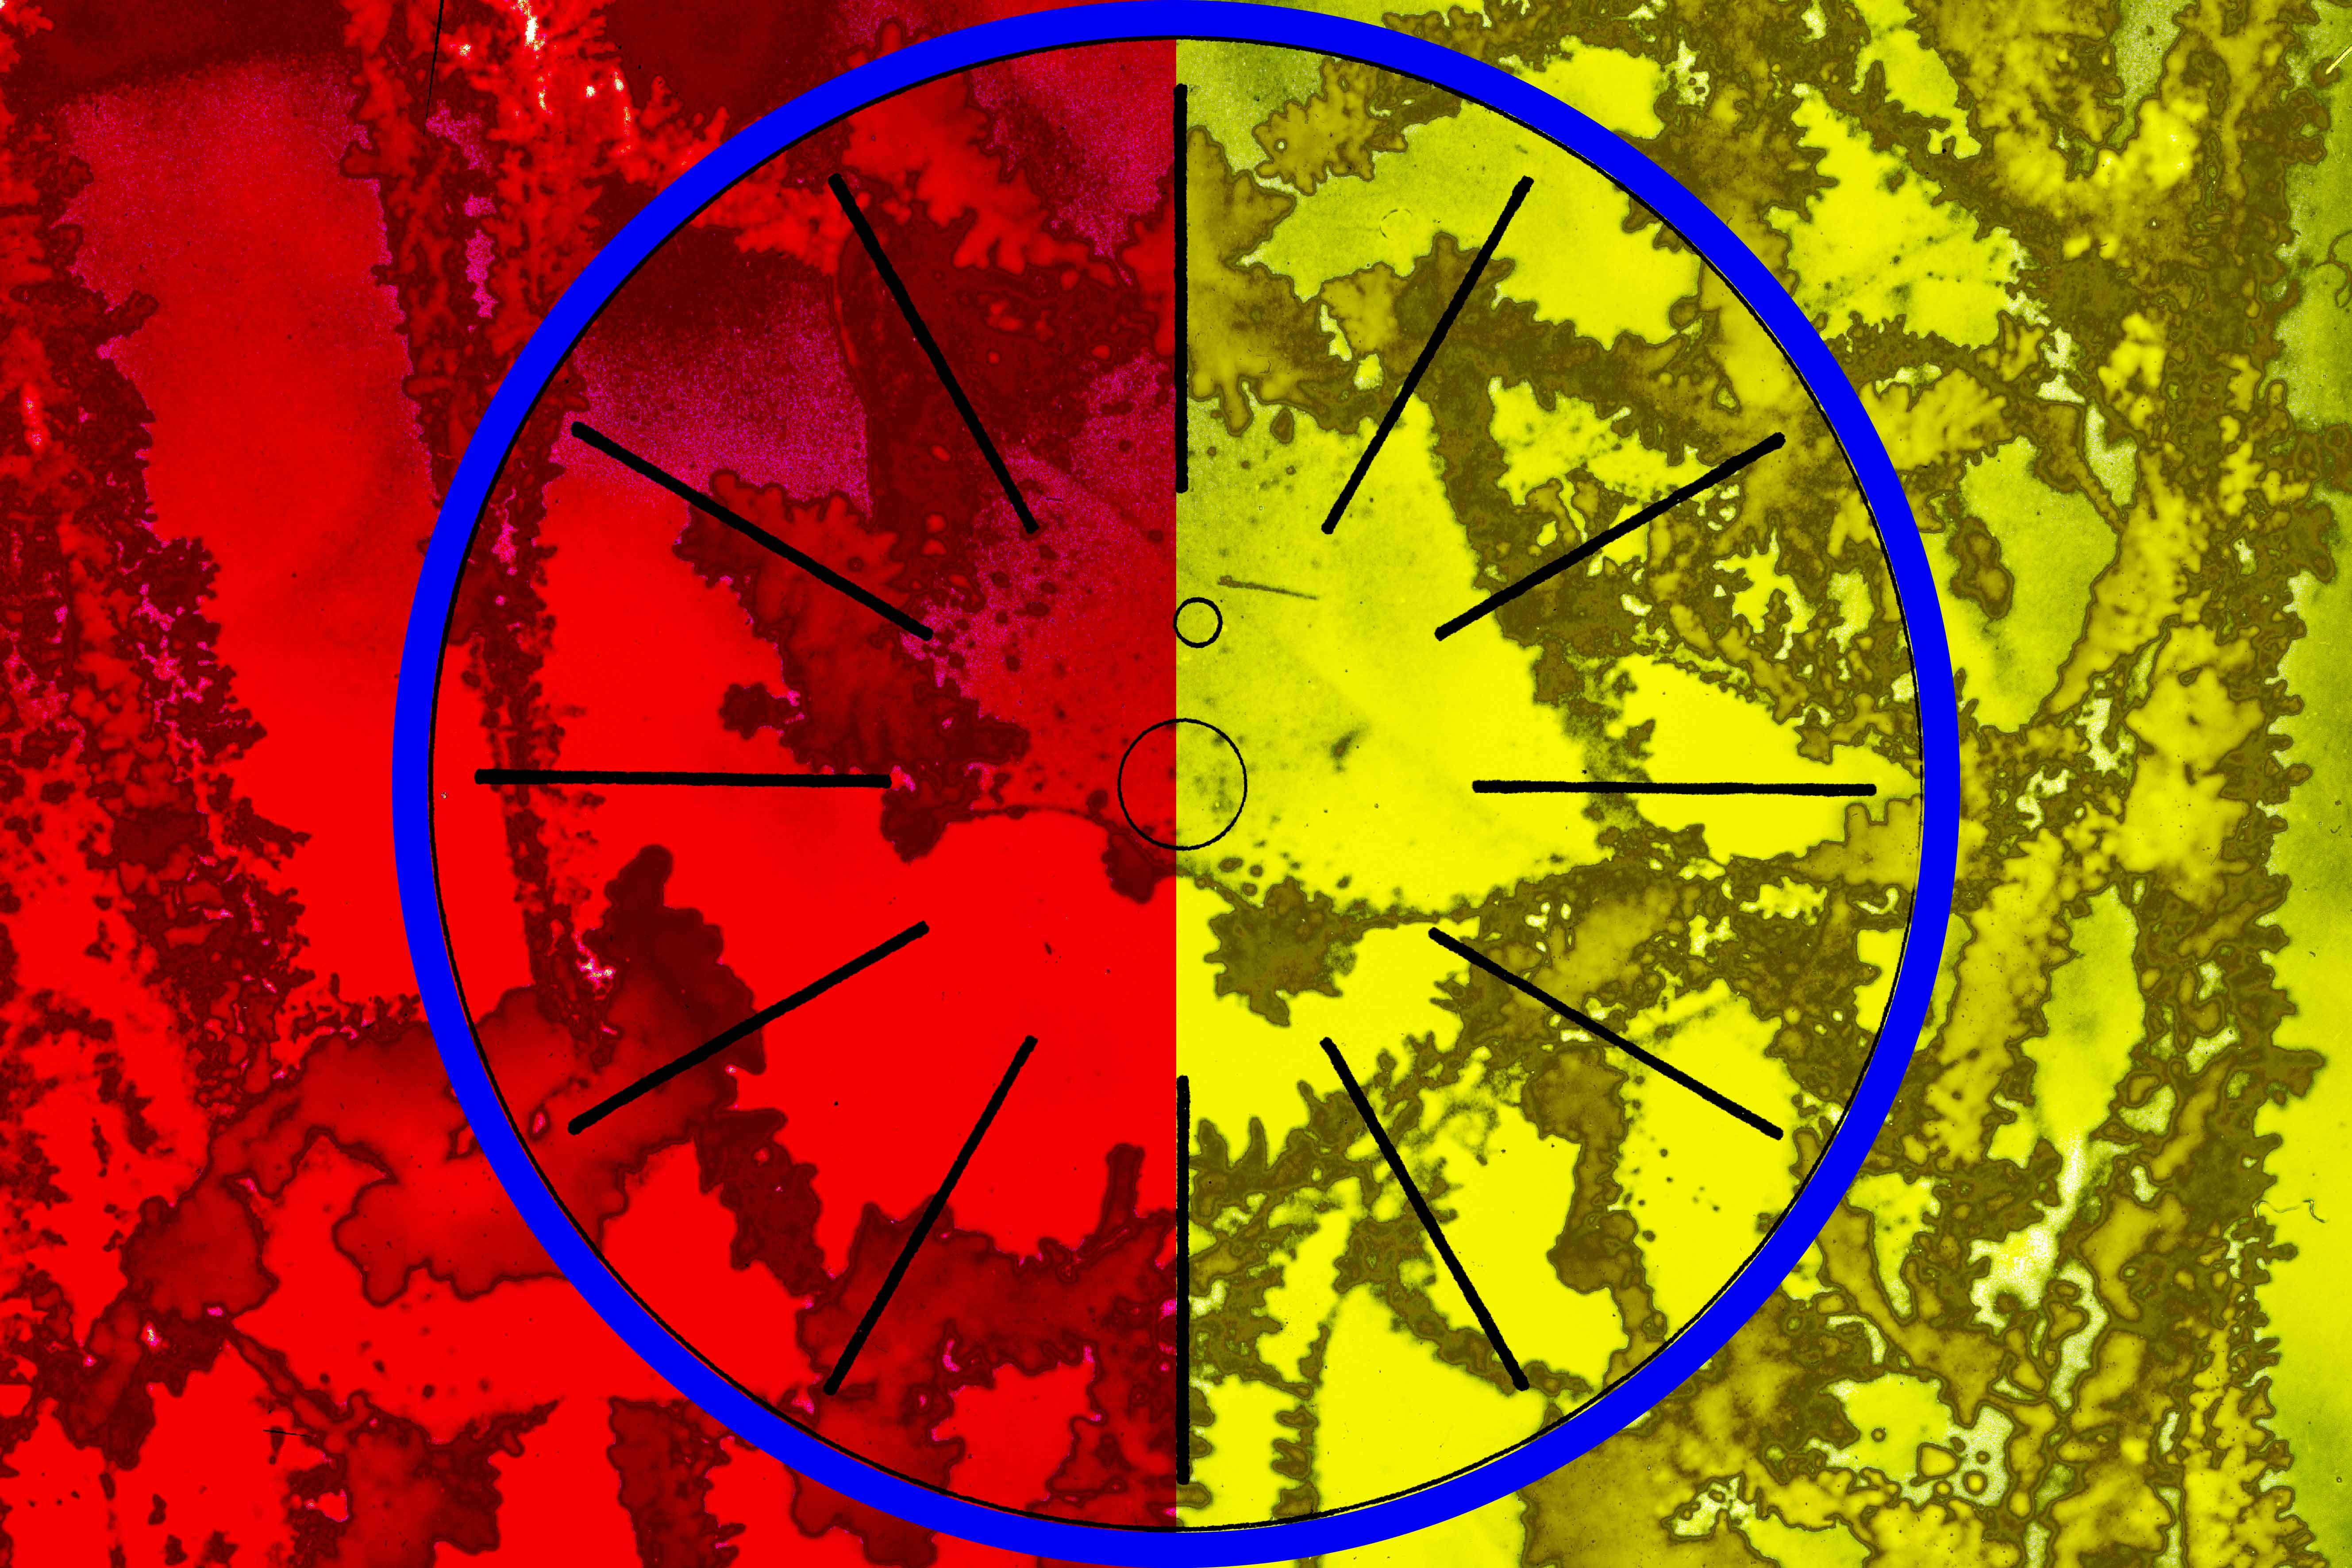 Line Segments - Blue-circle